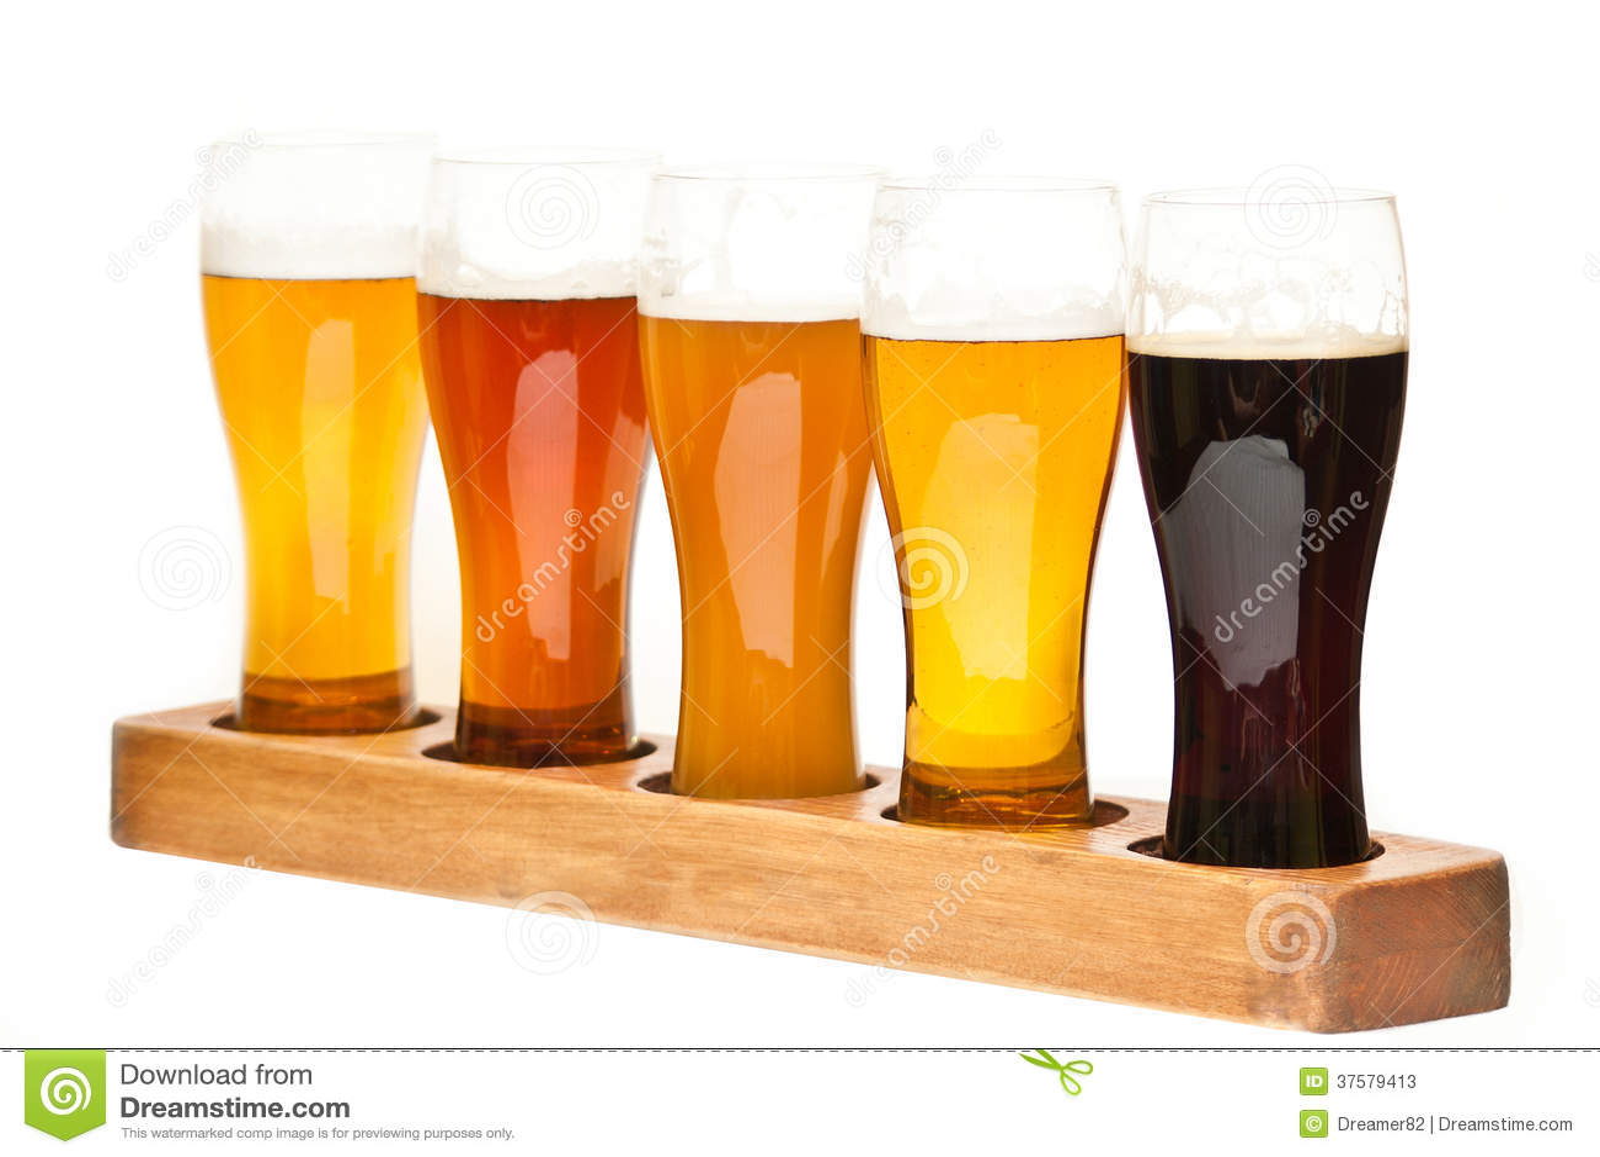 Vol de bière.